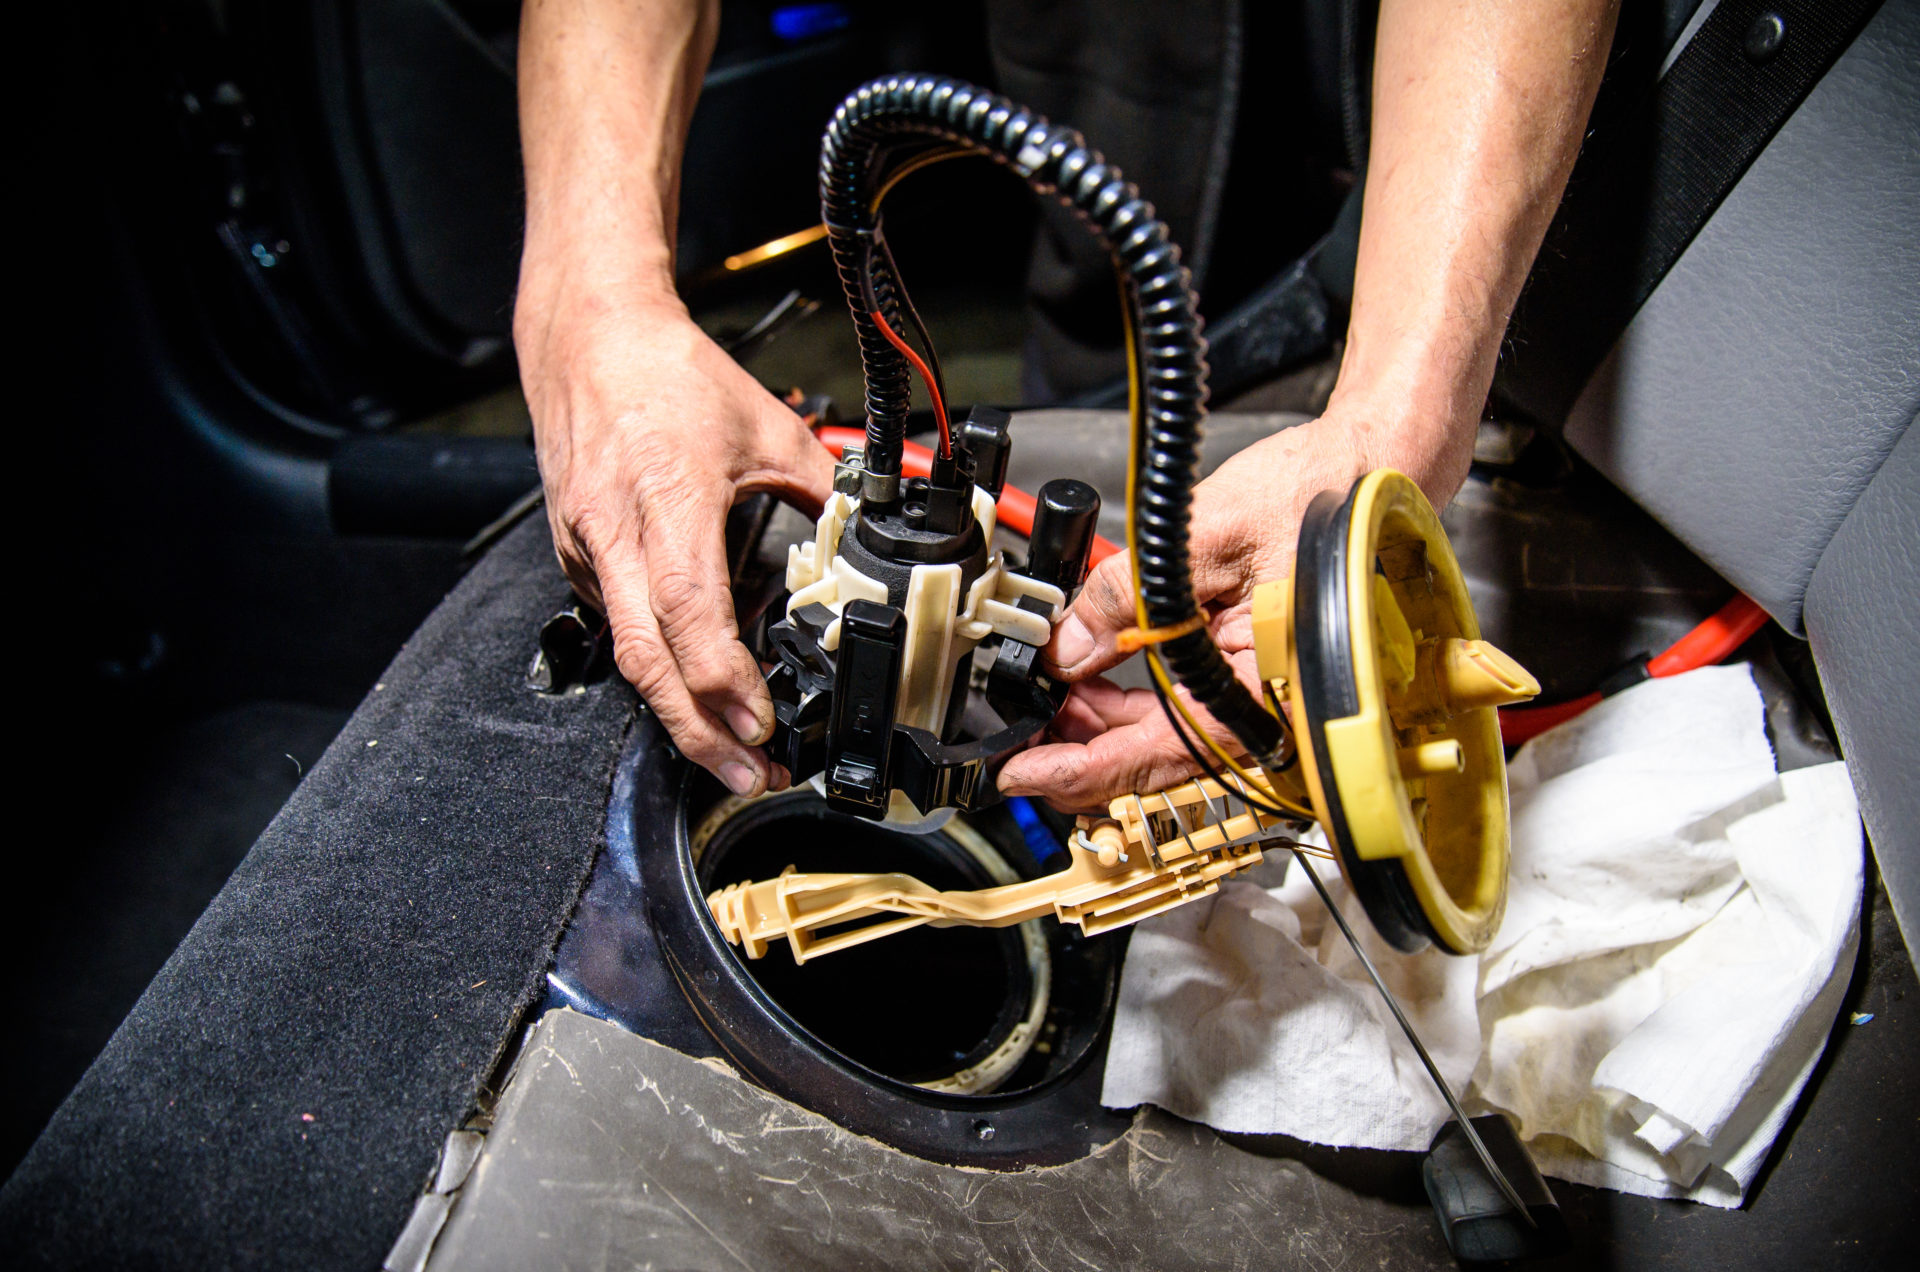 hight resolution of bmw e39 m5 fuel pump repair with deatschwerks